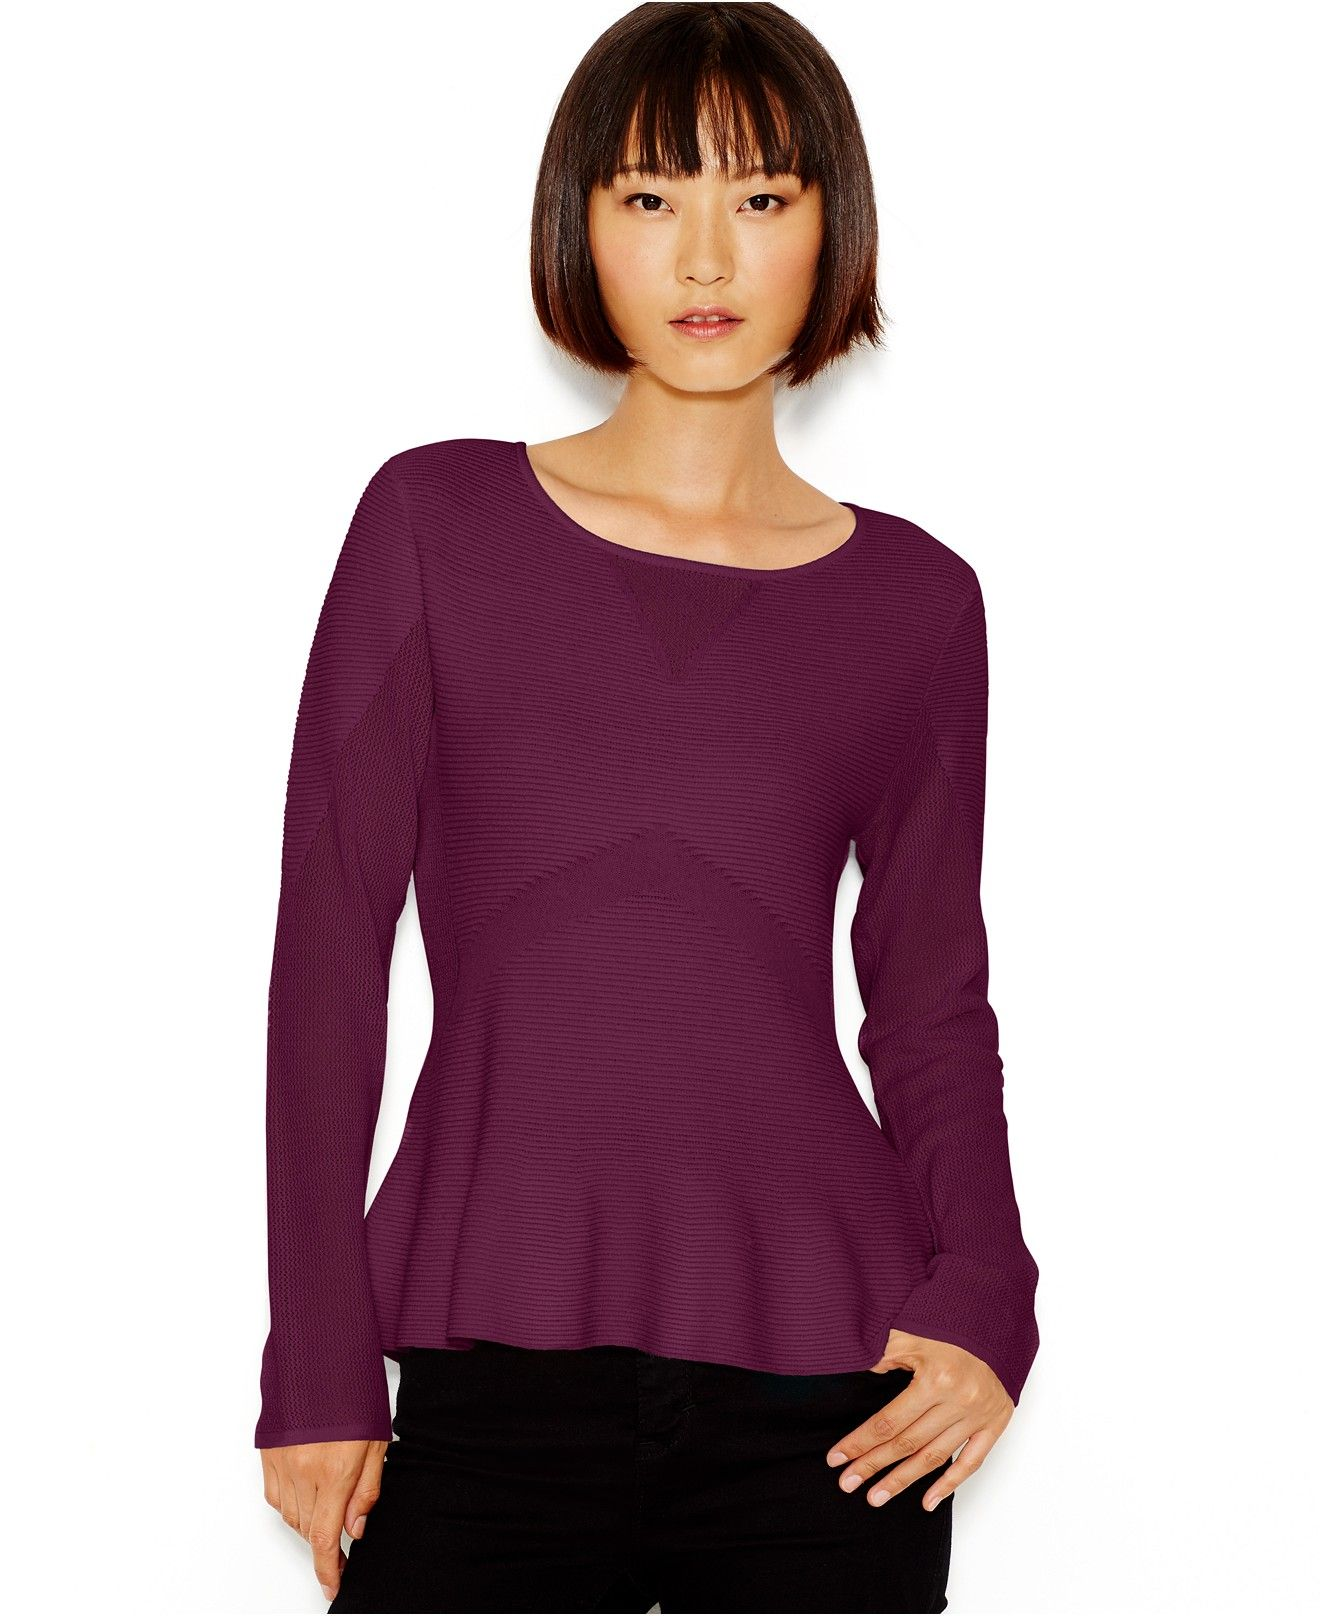 Bar III Long-Sleeve Peplum Sweater, Only at Macy's - Bar III - Women - Macy's